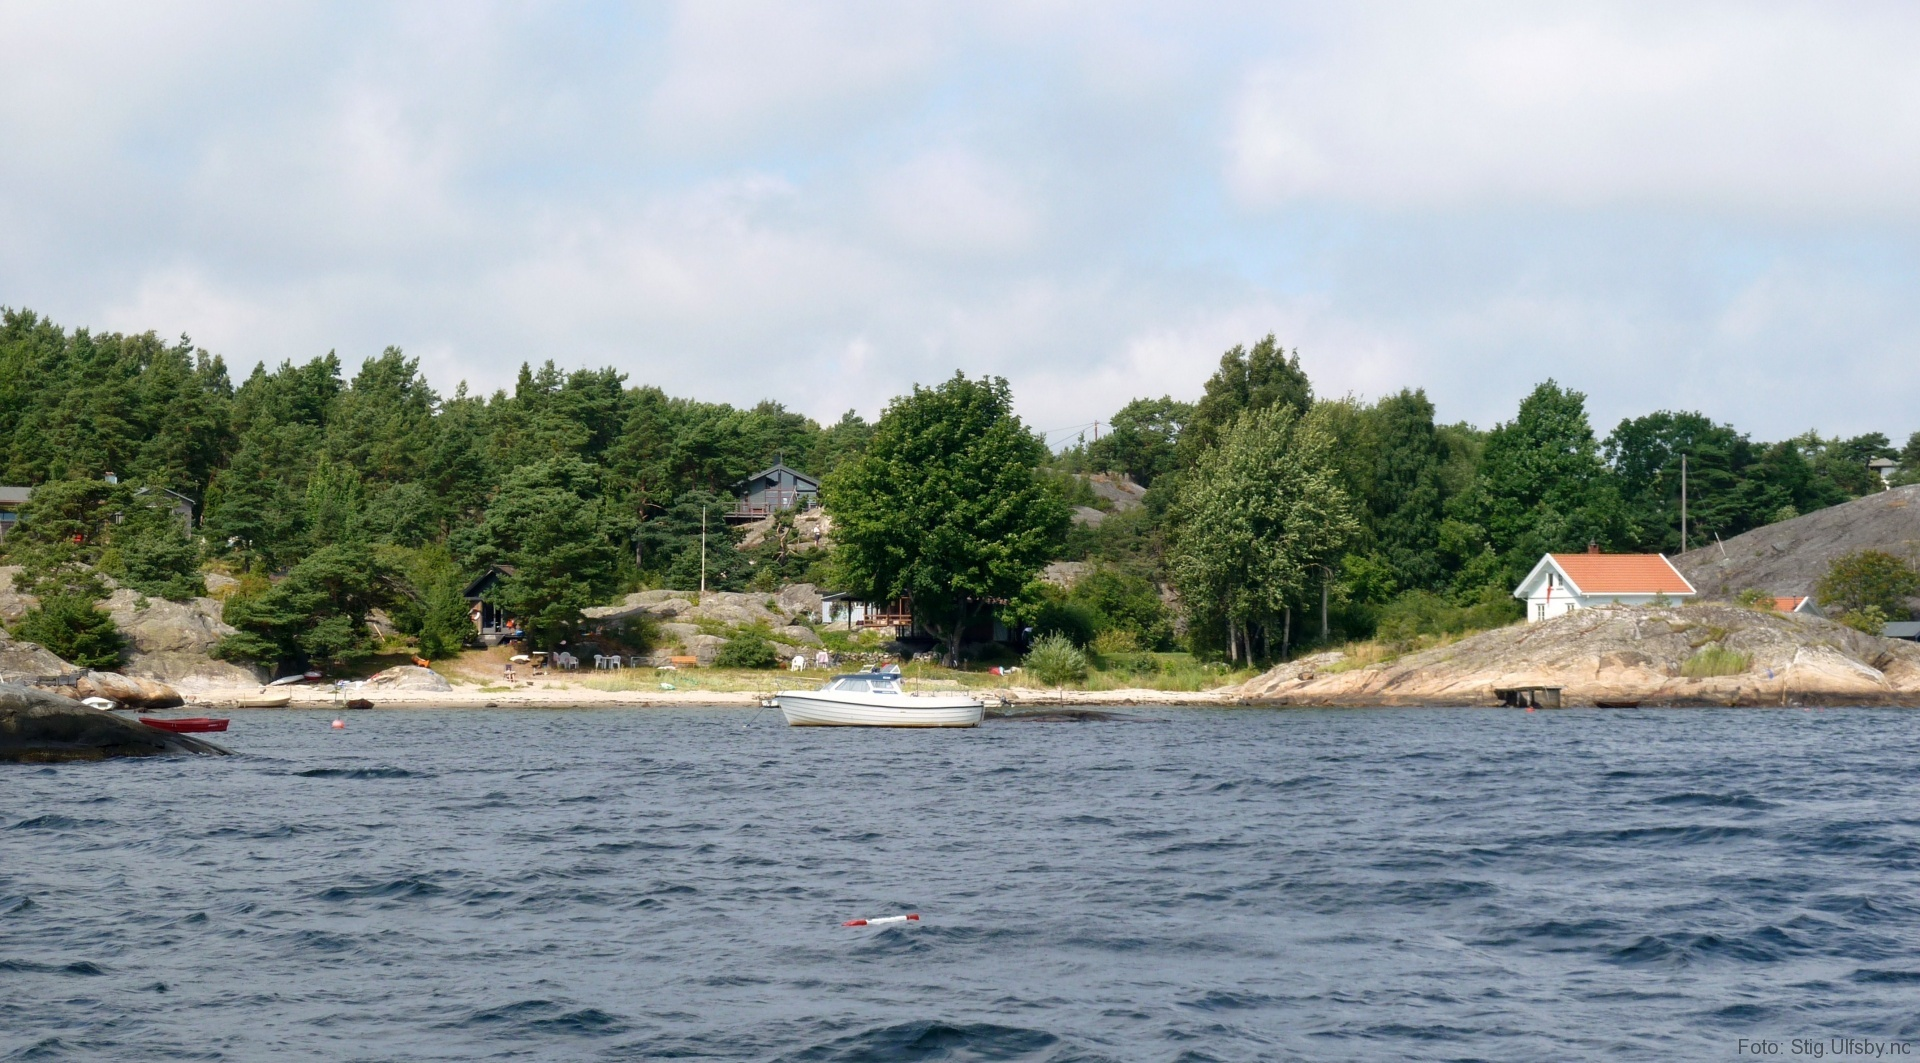 Kasa på Søndre Sandøy, Hvaler juli 2010